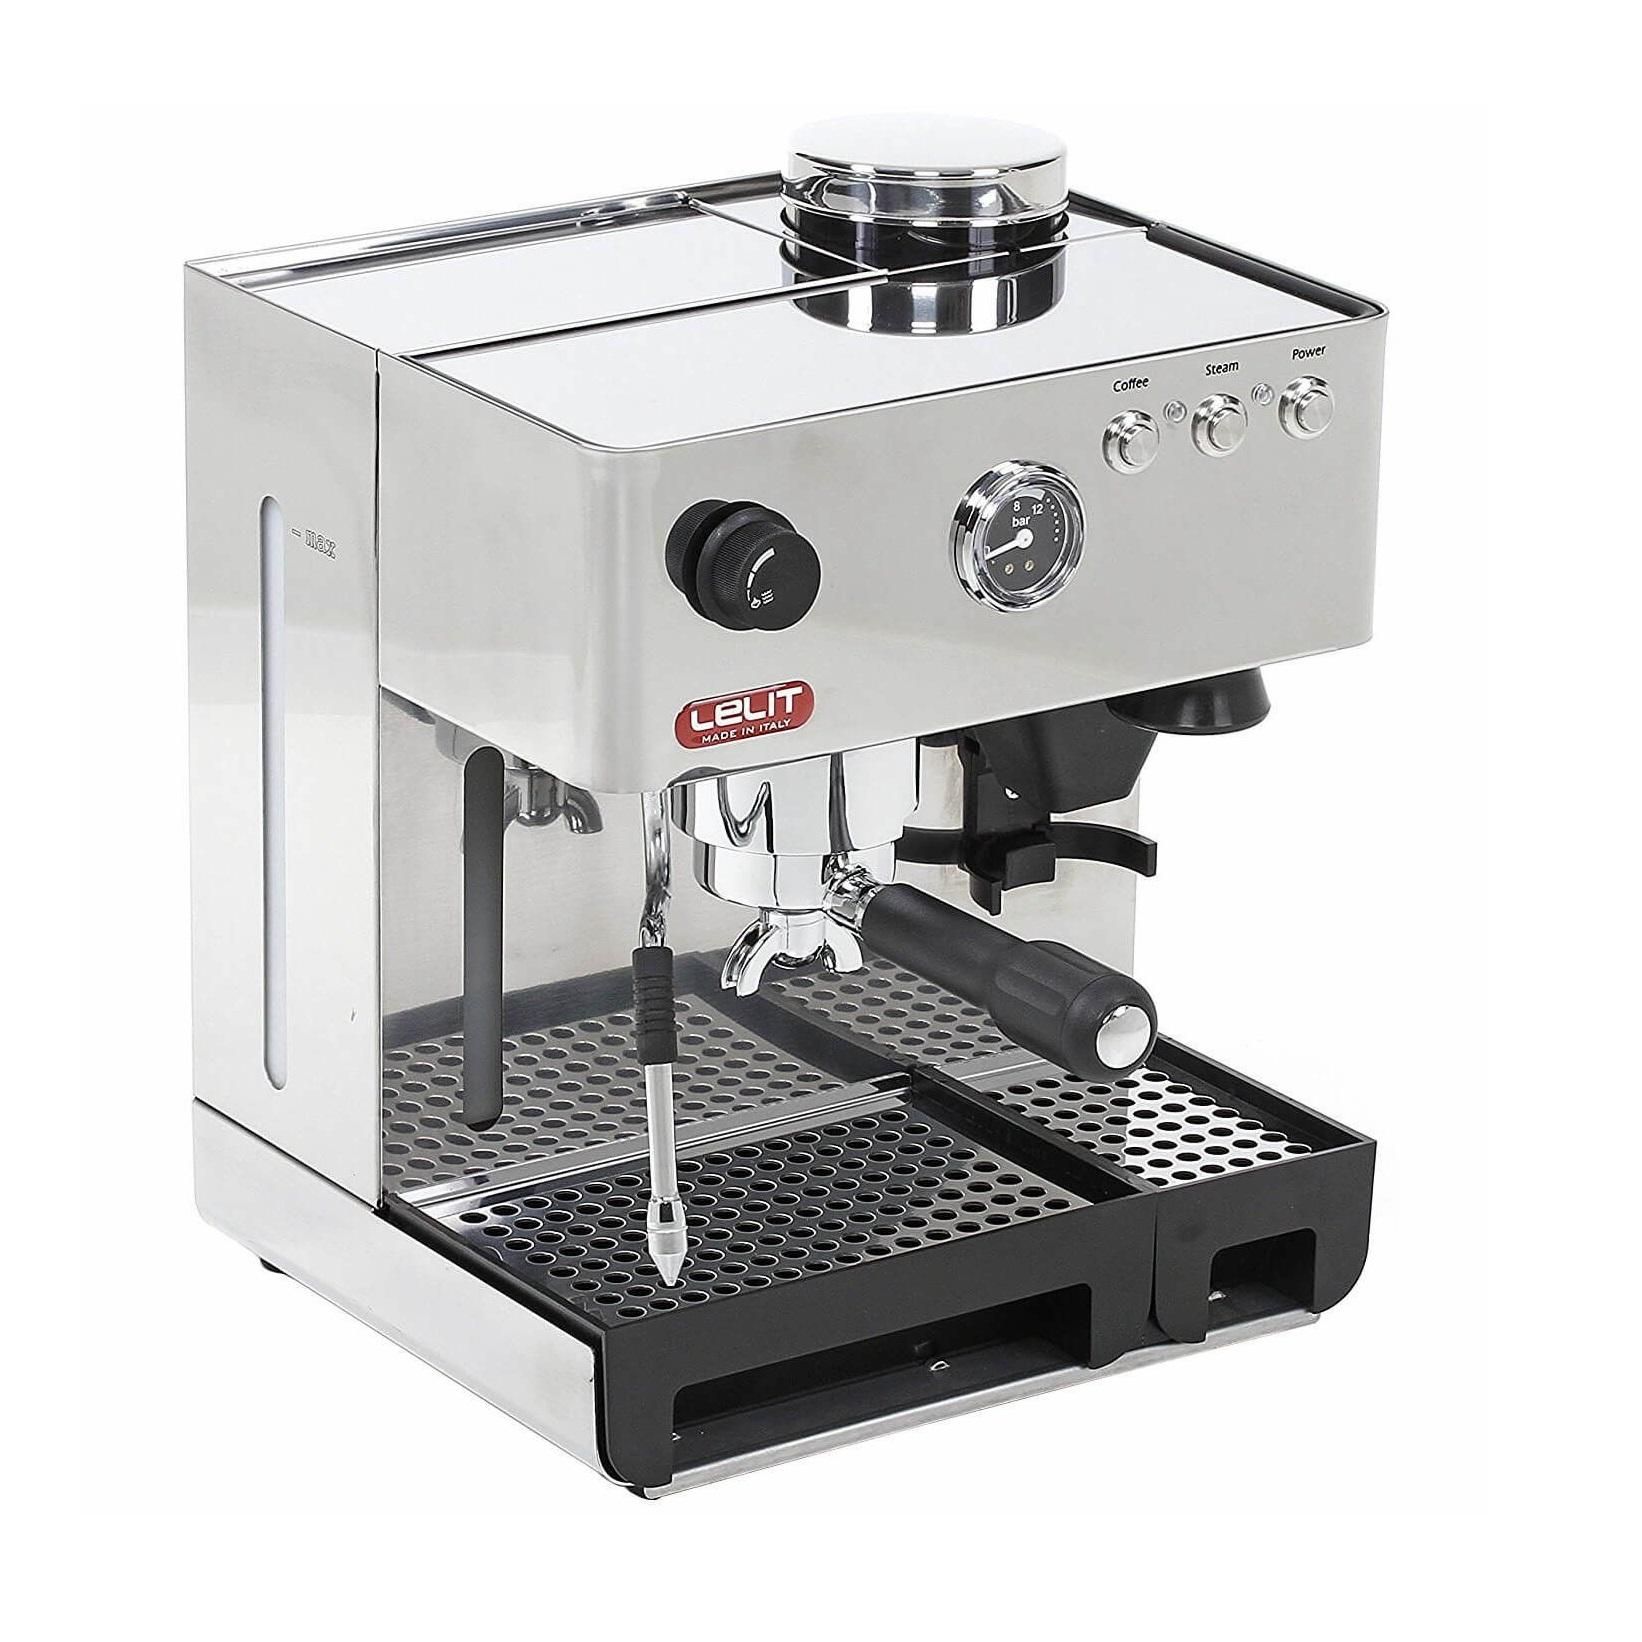 Espressor manual Lelit PL 42 EMI, 1200 W, 2.7 L, 15 bar, rasnita, manometru